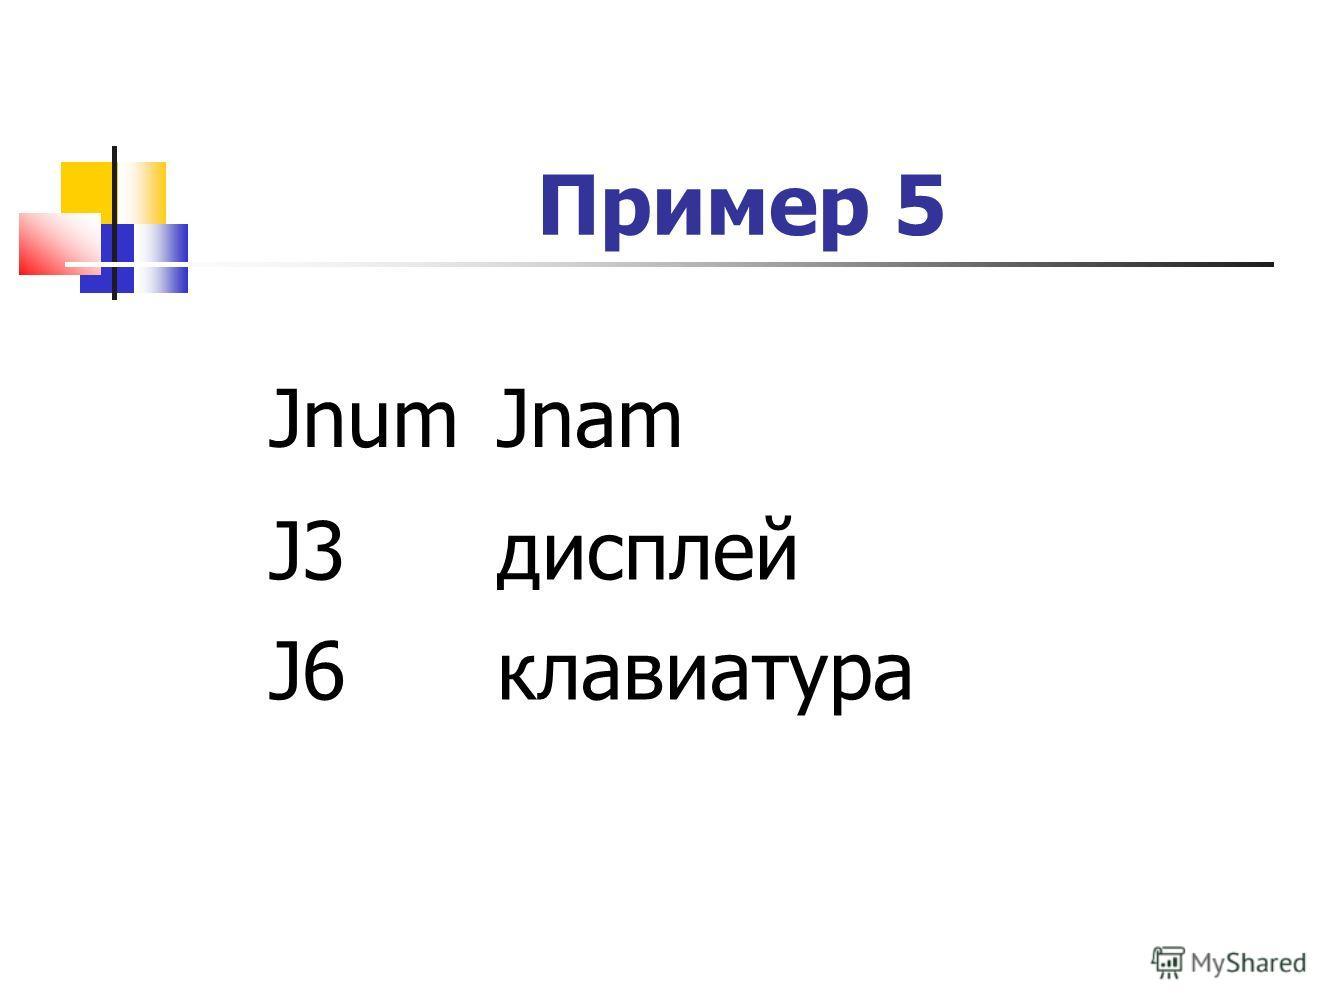 Пример 5 JnumJnam J3дисплей J6клавиатура